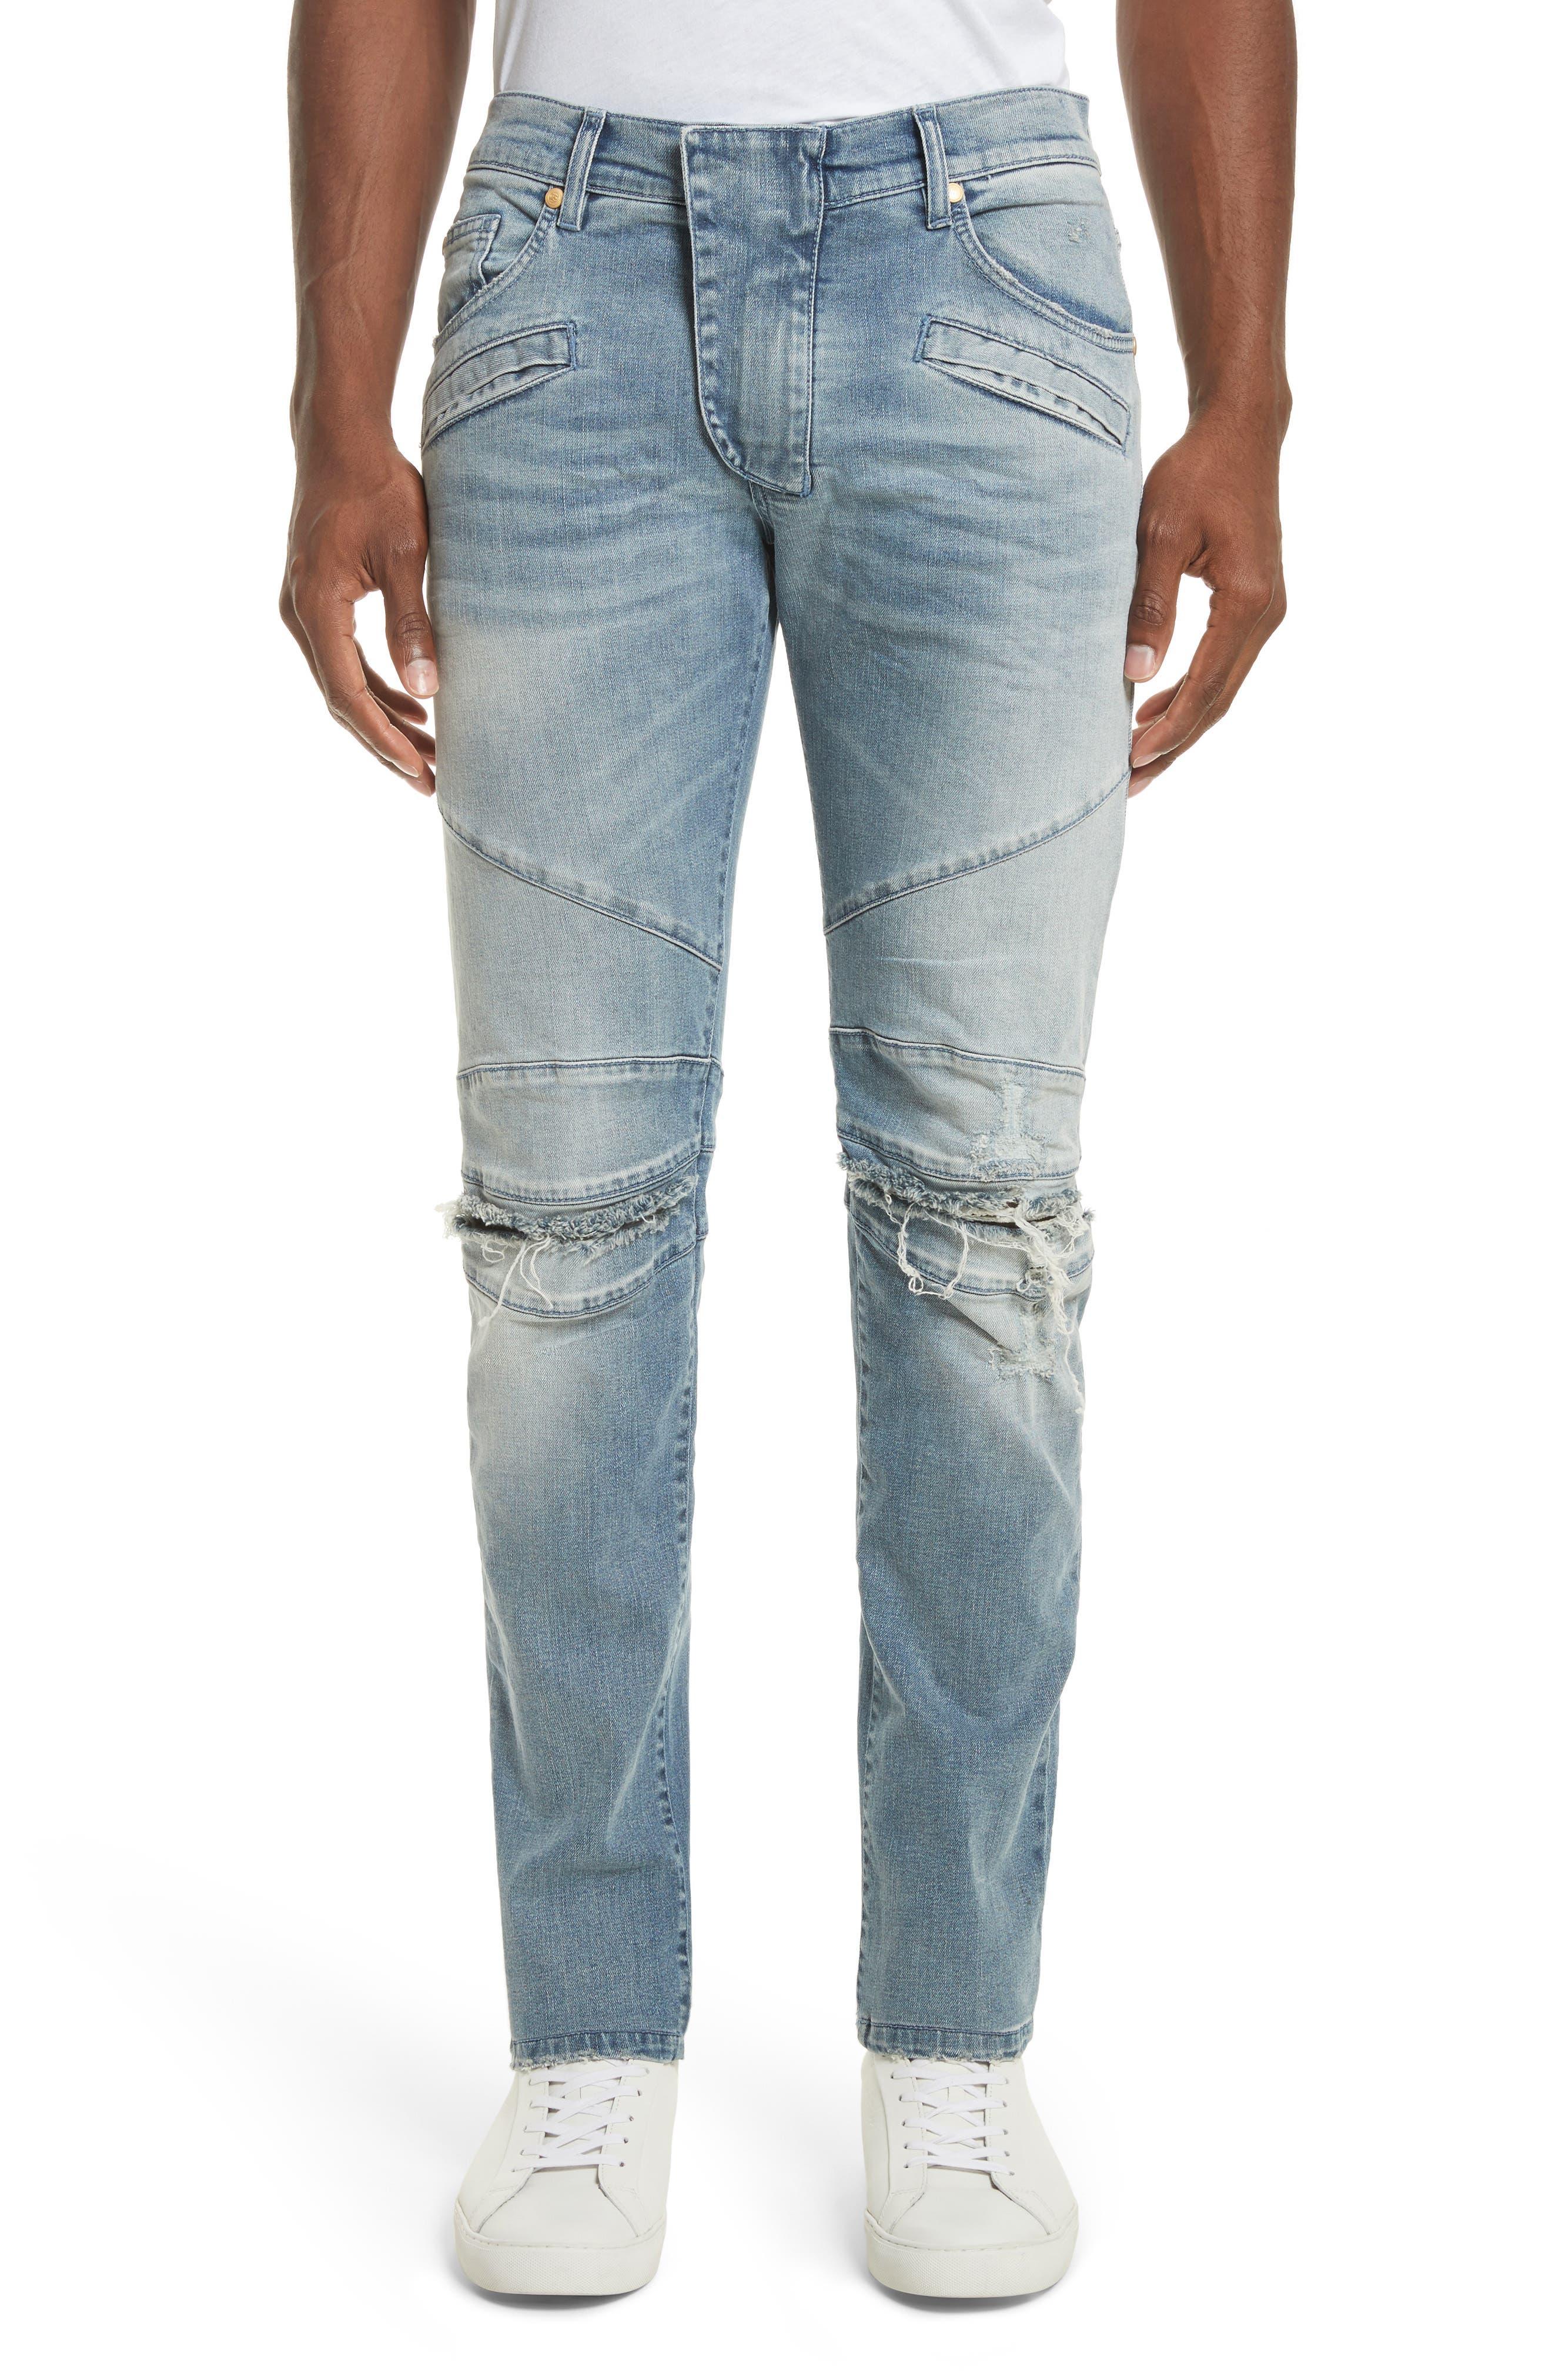 PIERRE BALMAIN Slit Knee Jeans